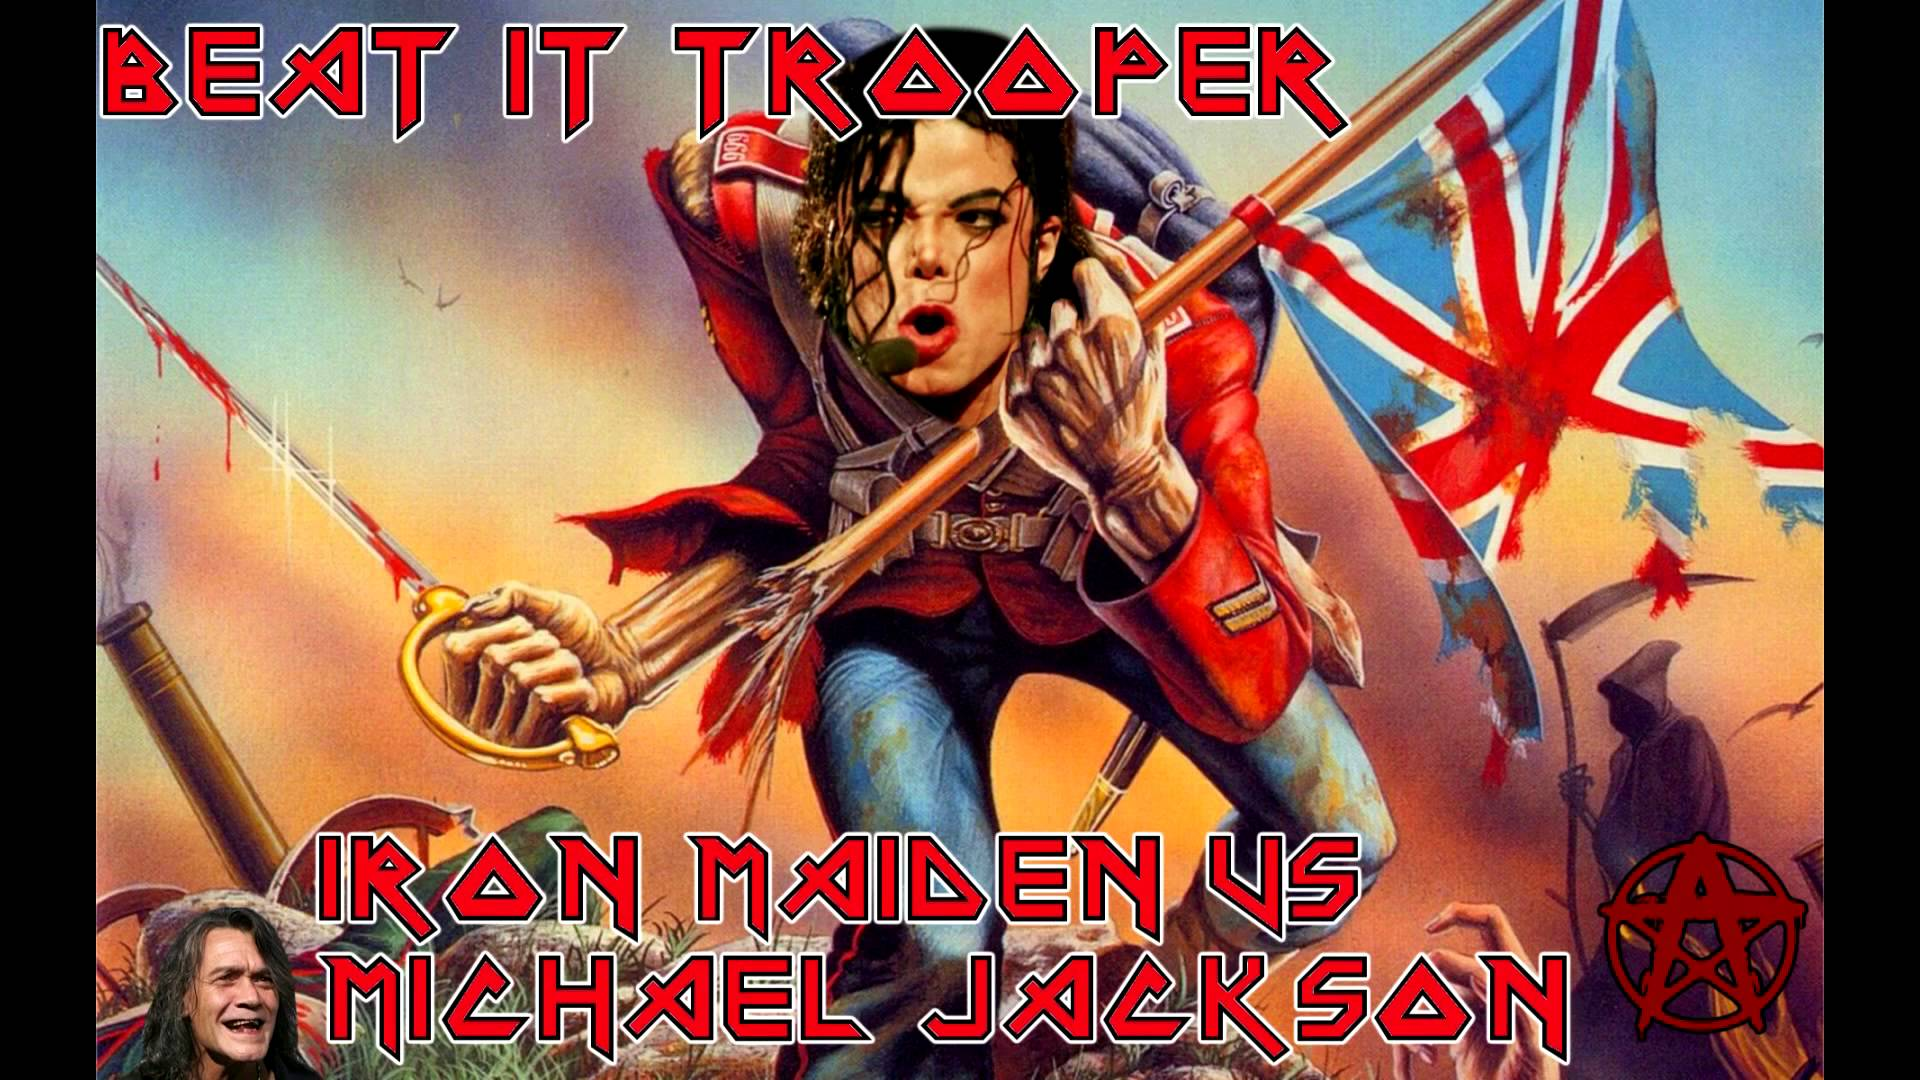 Mashup Monday: Beat It, Trooper! [Iron Maiden vs. Michael Jackson]